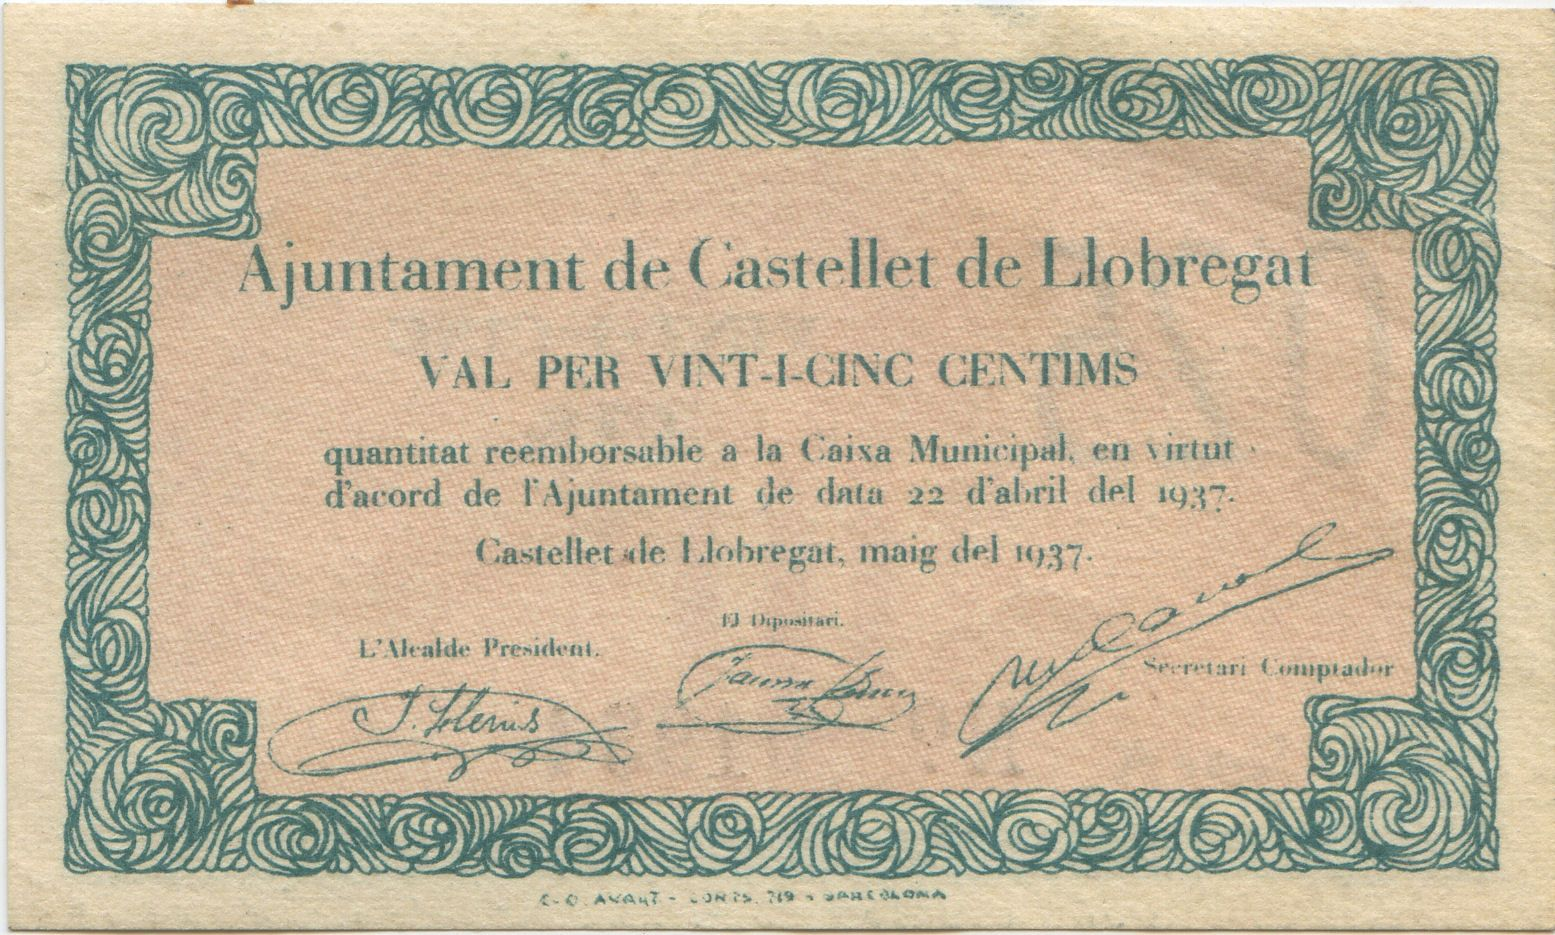 25 cèntims (Castellet de Llobregat, 1937)